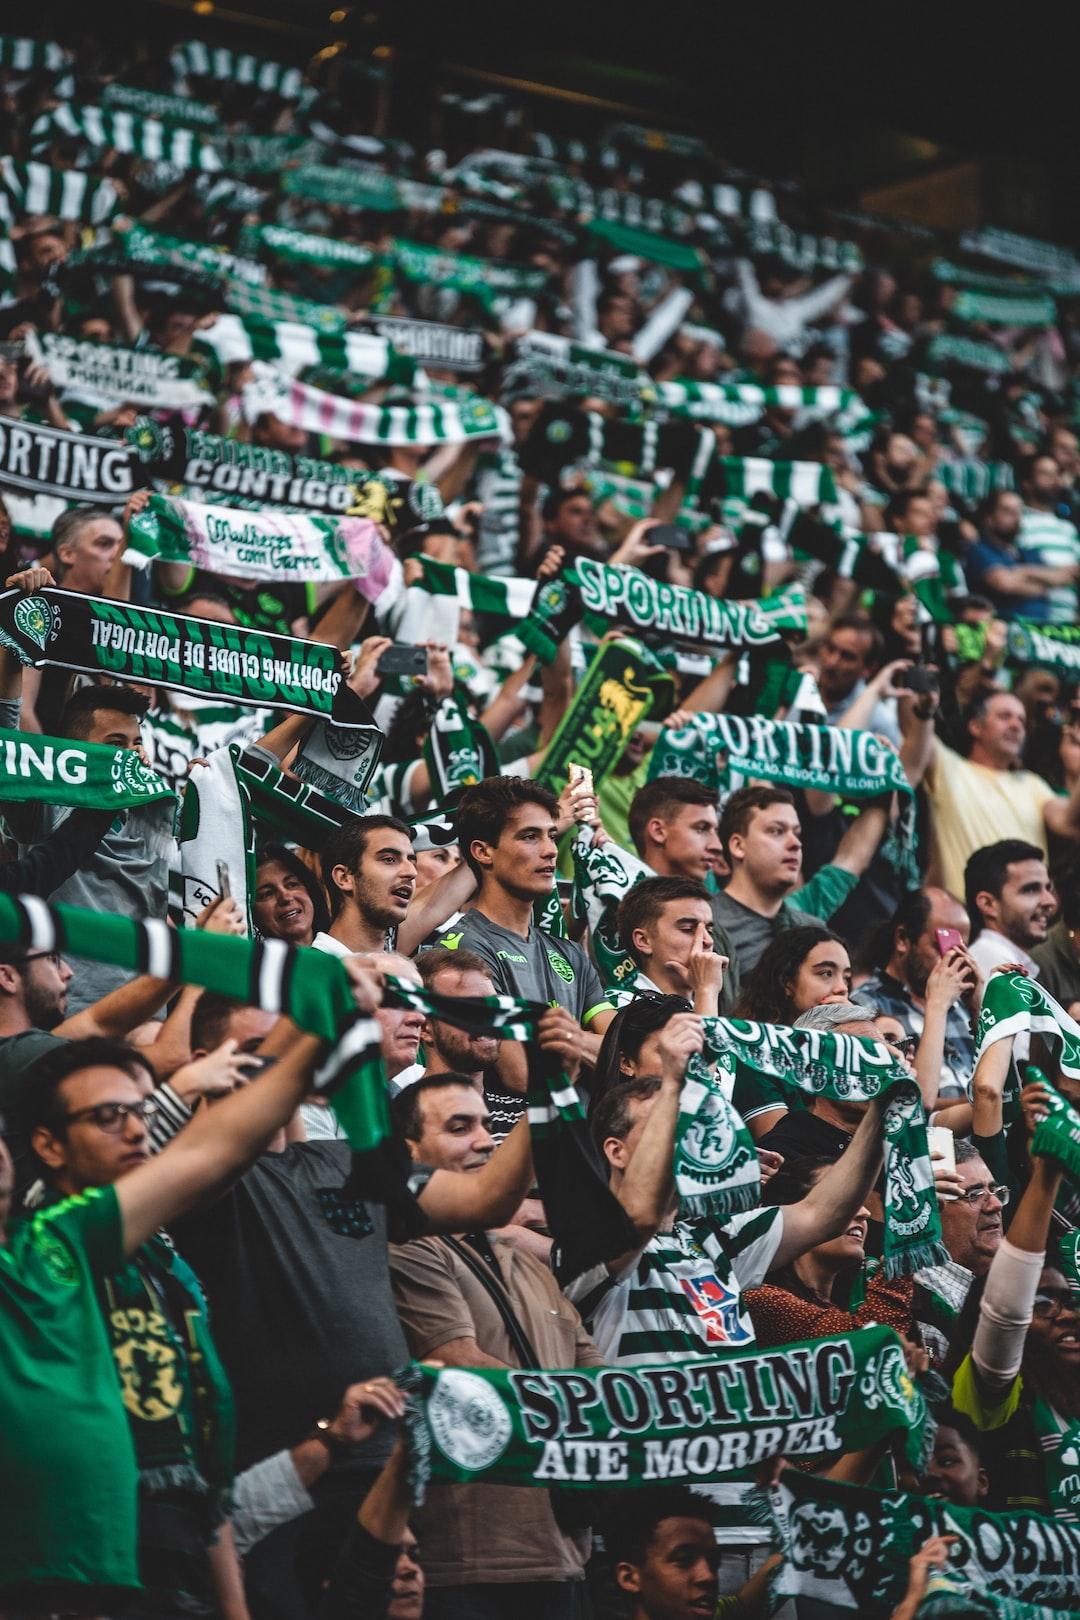 Sporting Fans singing